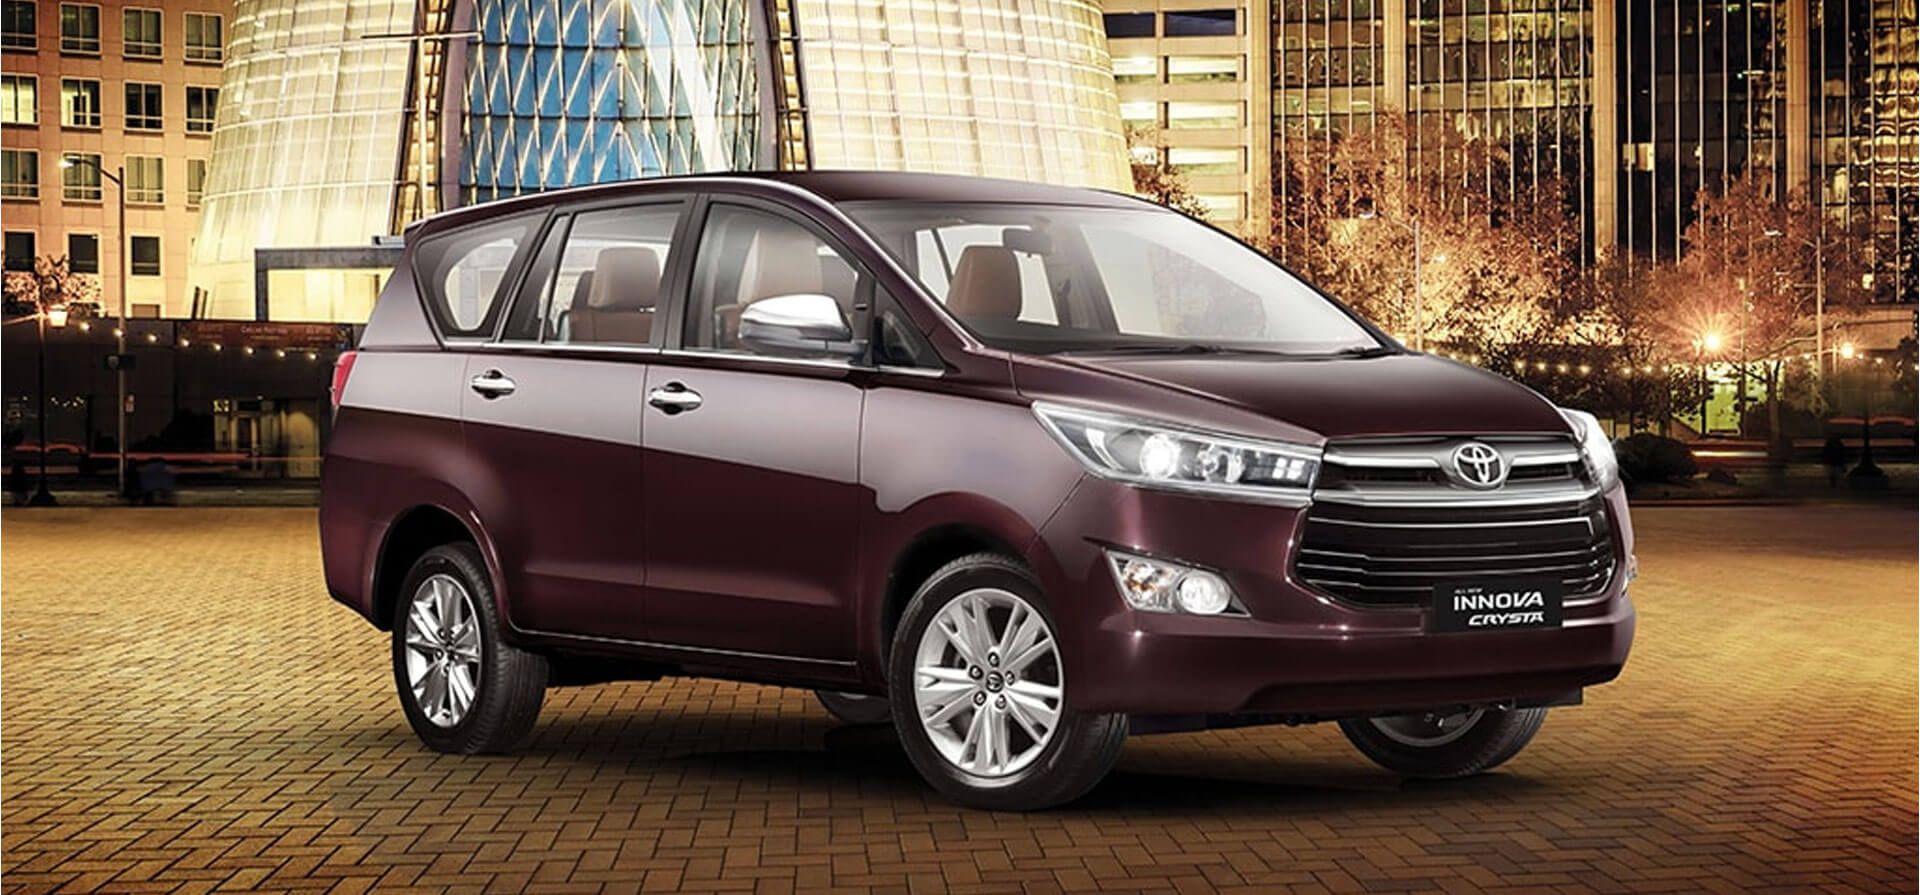 Adarek Rent a Car Toyota innova, Car rental, Toyota